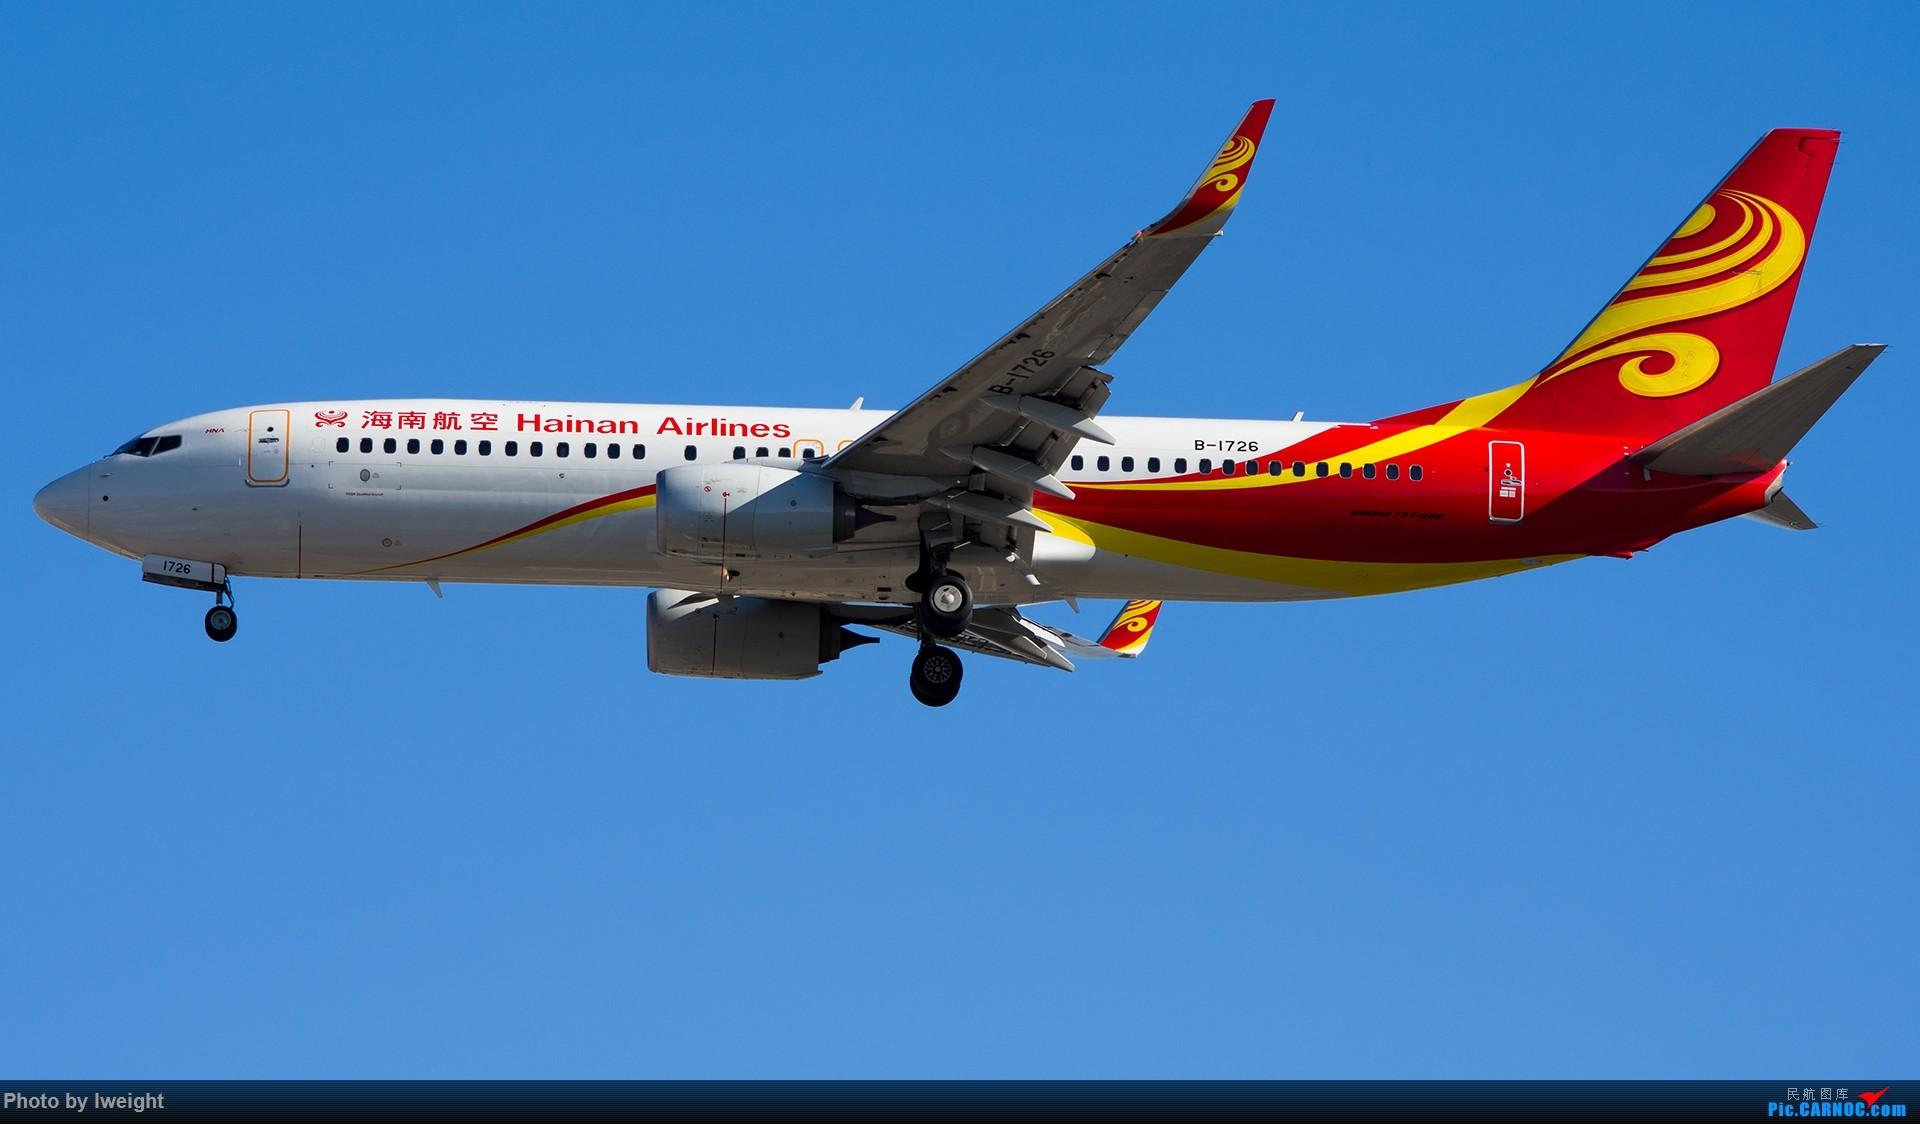 Re:[原创]终于在12月的北京等到了一个晴天的周末,出来拍拍飞机【2015-12-5】 BOEING 737-800 B-1726 中国北京首都国际机场